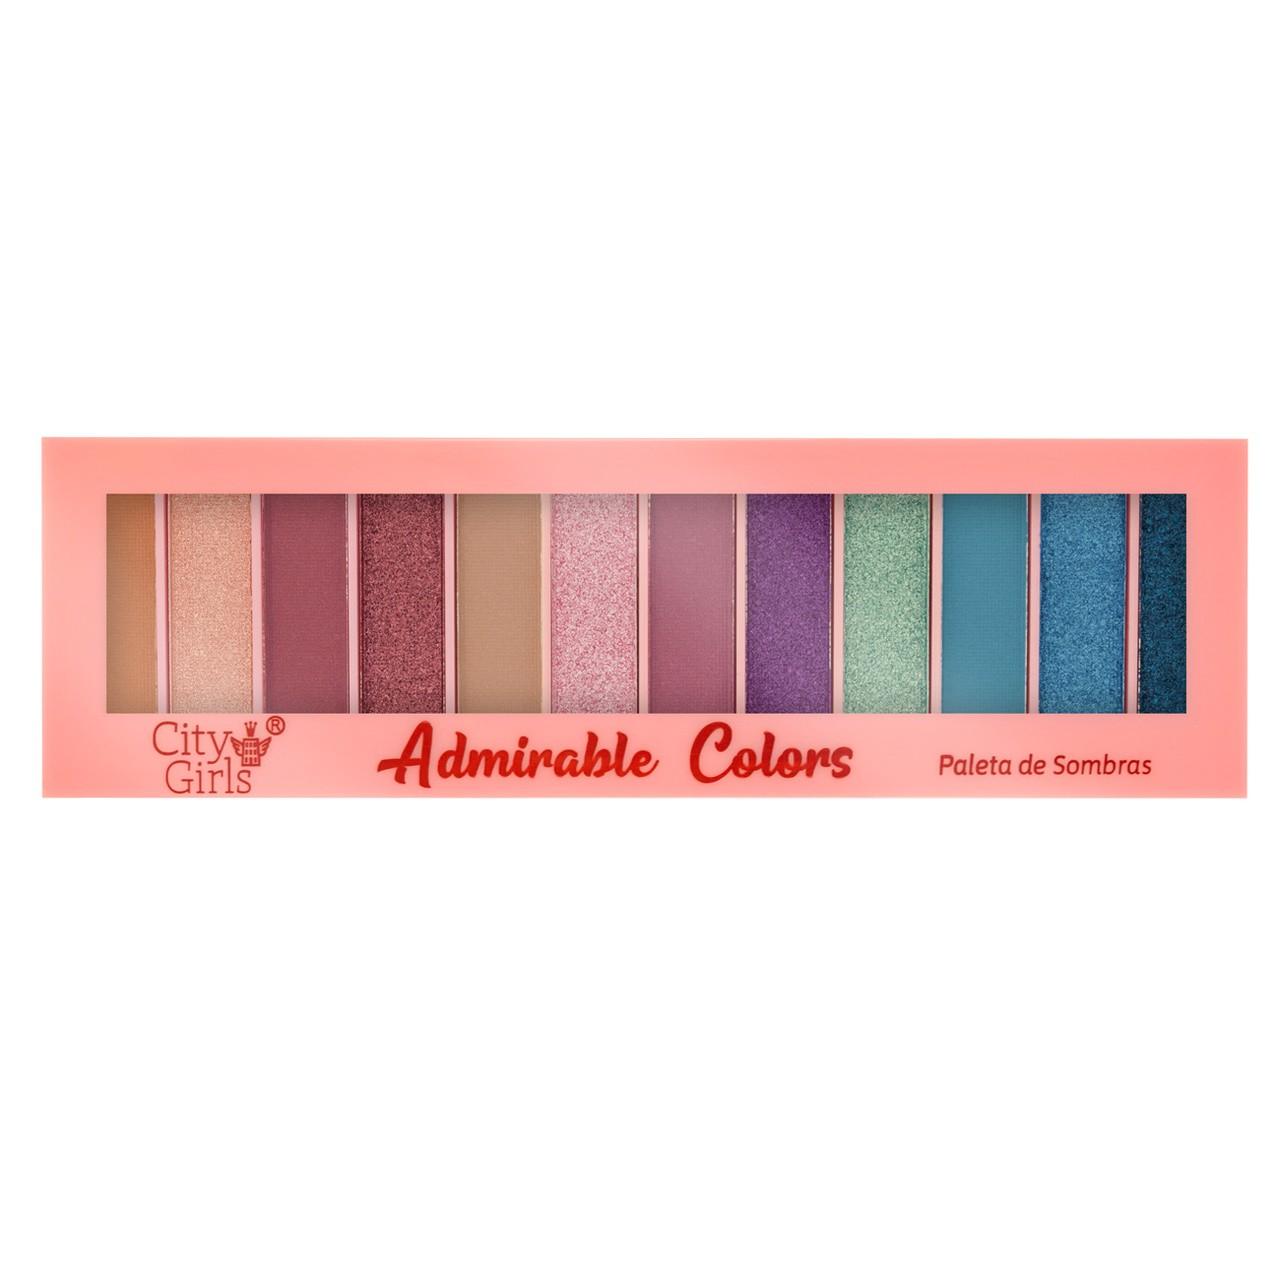 Paleta de Sombras 12 cores City Girls Admirable Colors